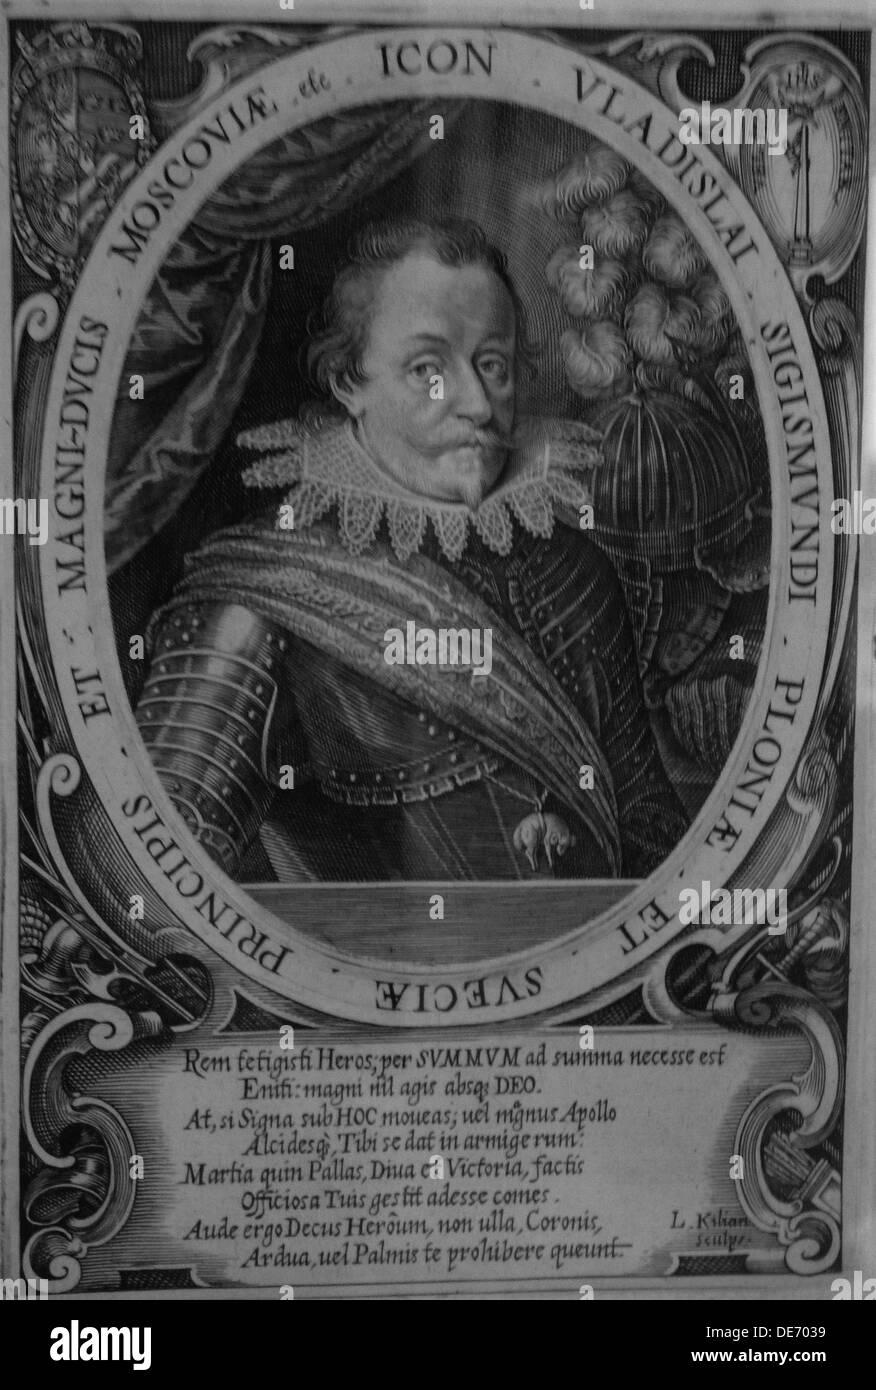 King Wladyslaw IV Vasa of Poland (1595-1648), Tsar of Russia, before 1632. Artist: Kilian, Lucas (1579-1637) - Stock Image